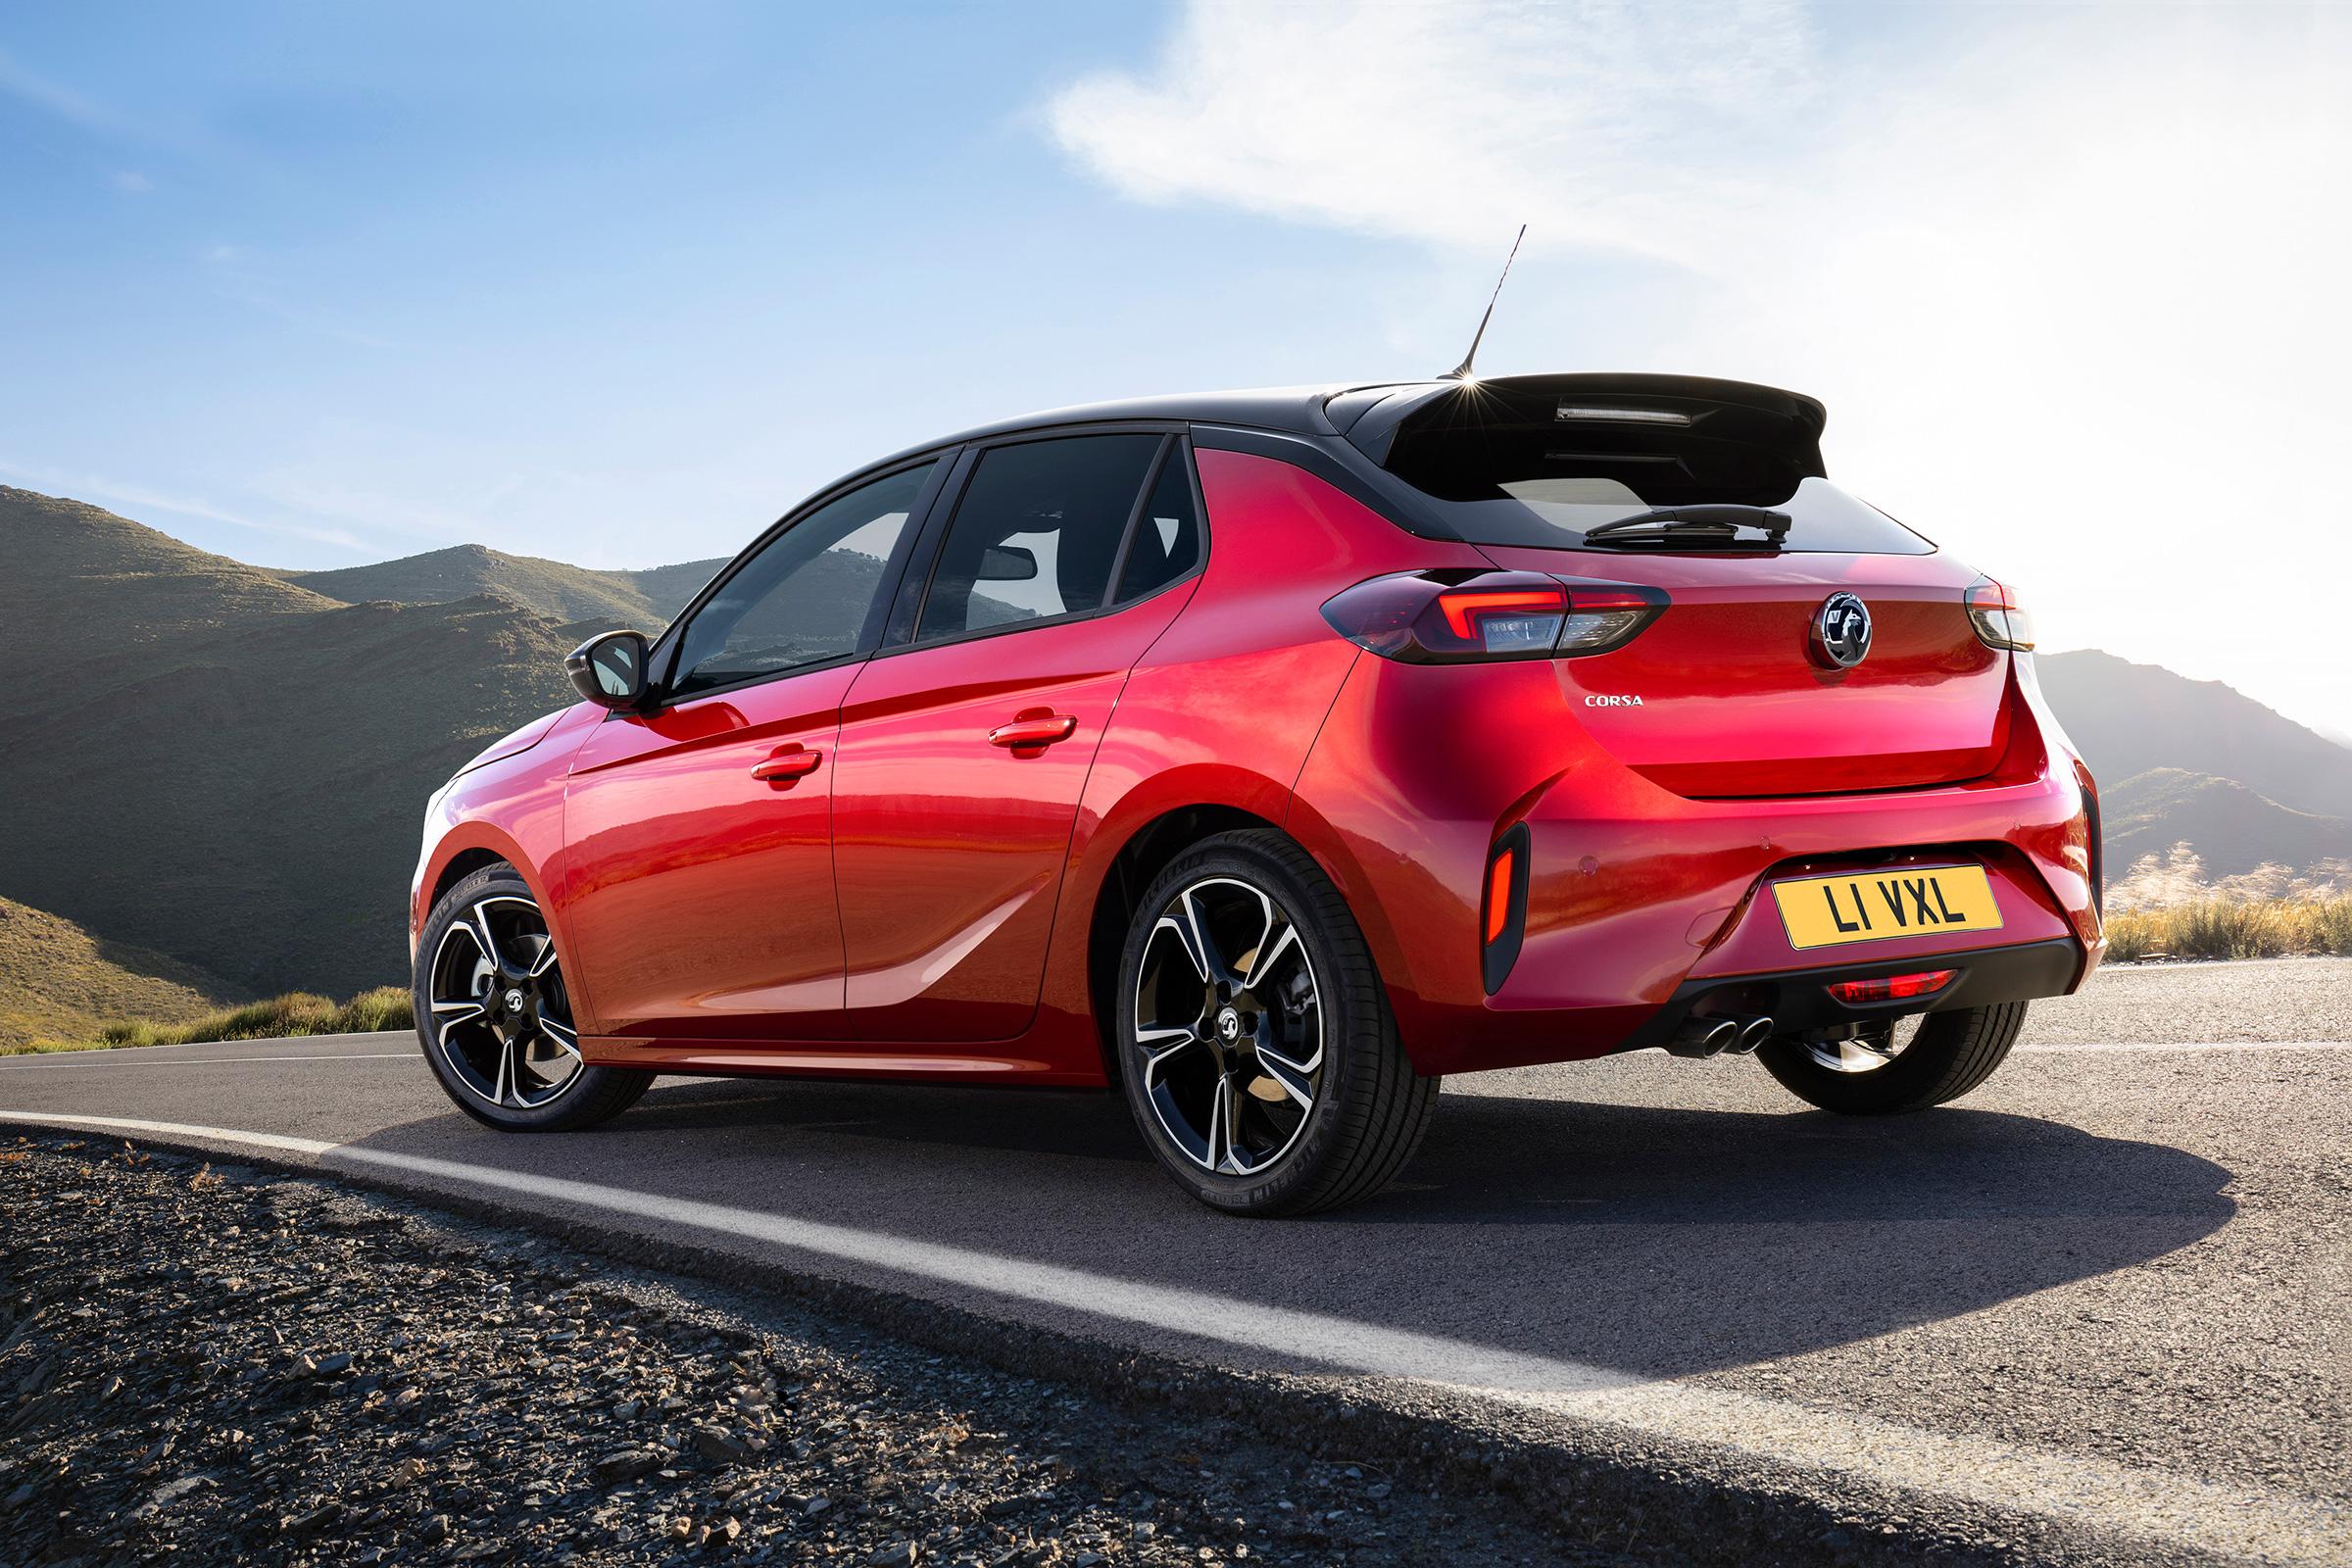 2020 Vauxhall Corsa VXR Review